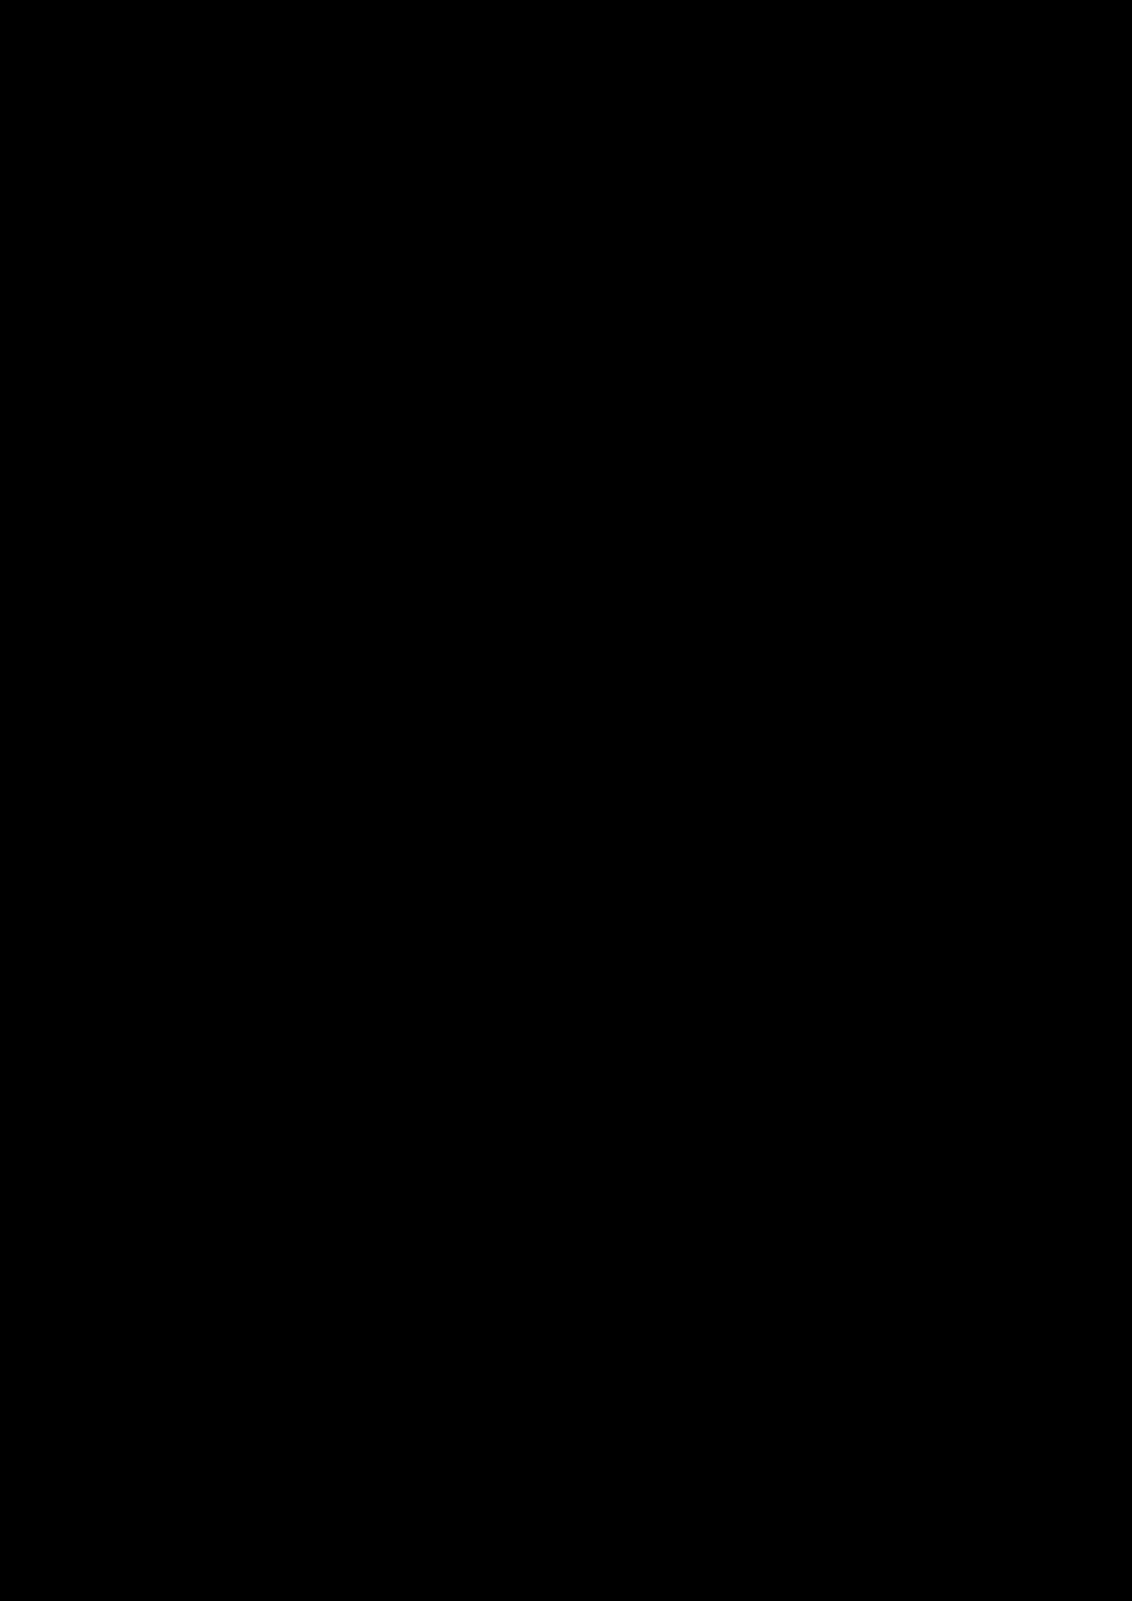 Ispoved Pervogo Boga slide, Image 34